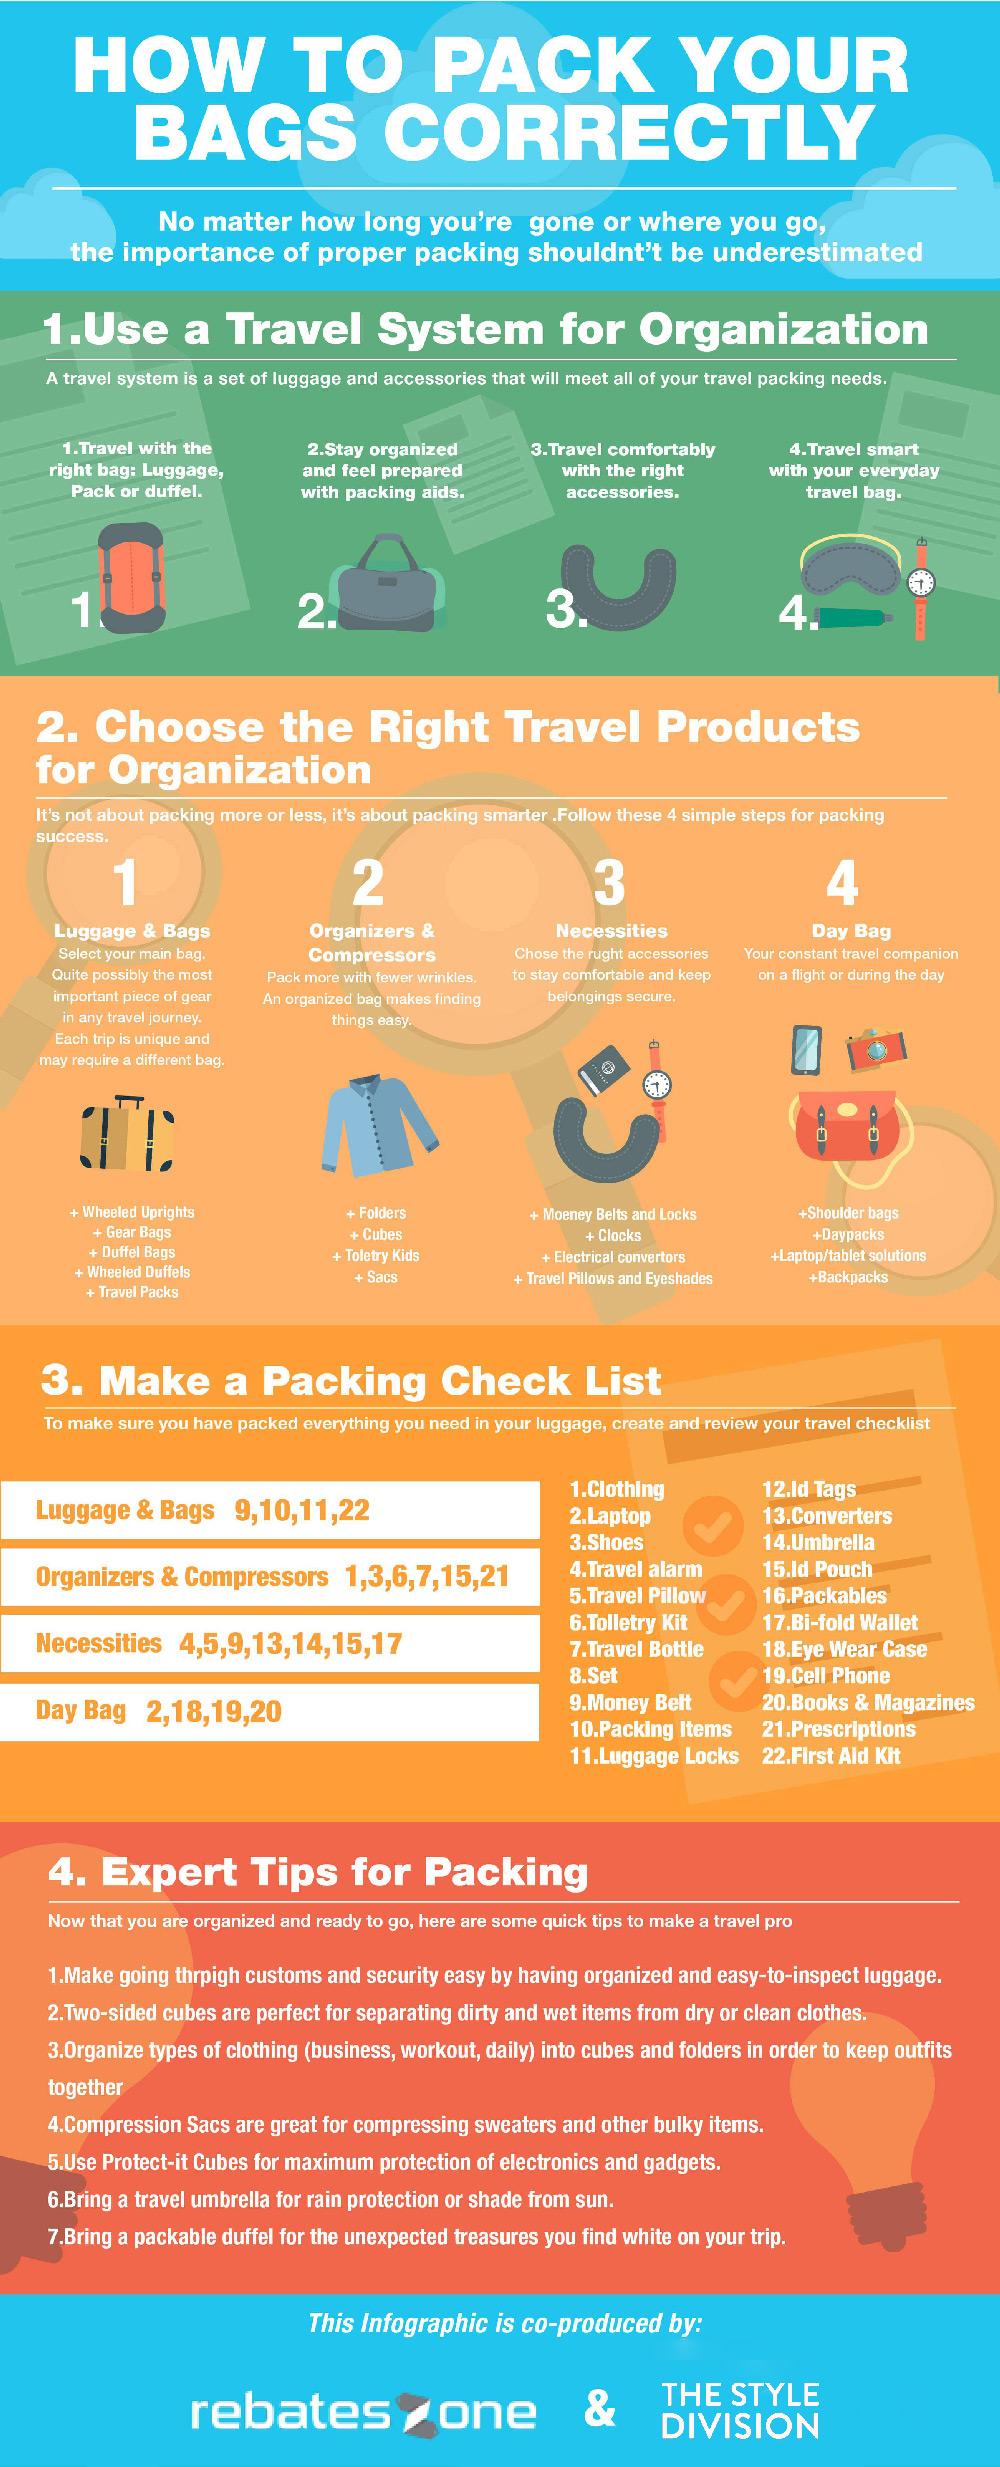 tipsforpacking